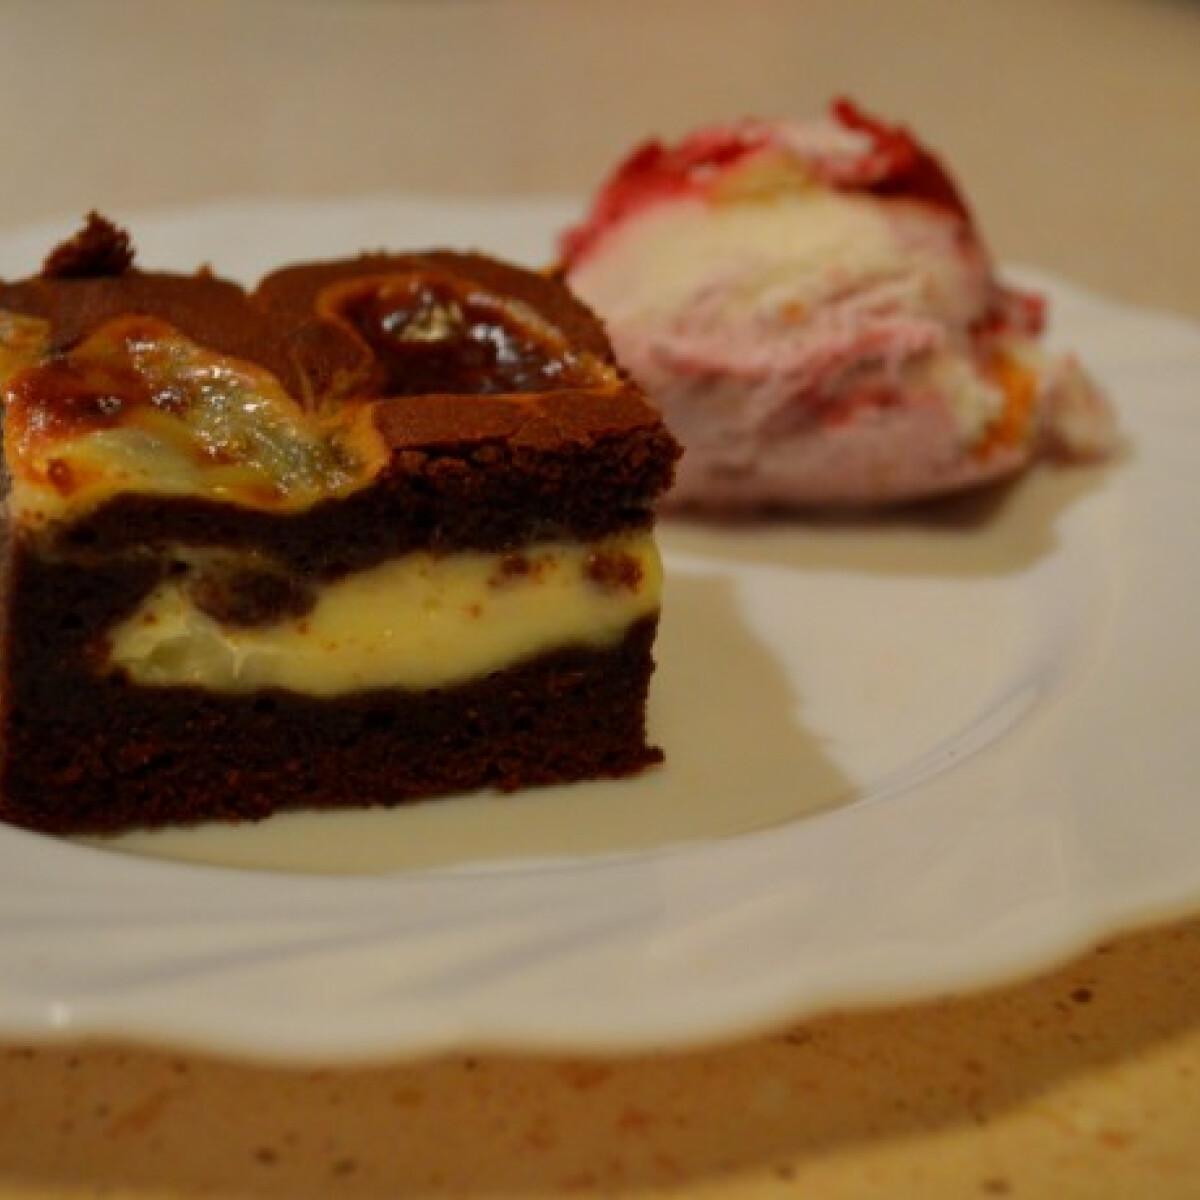 Ezen a képen: Brownie krémsajttal bolondítva